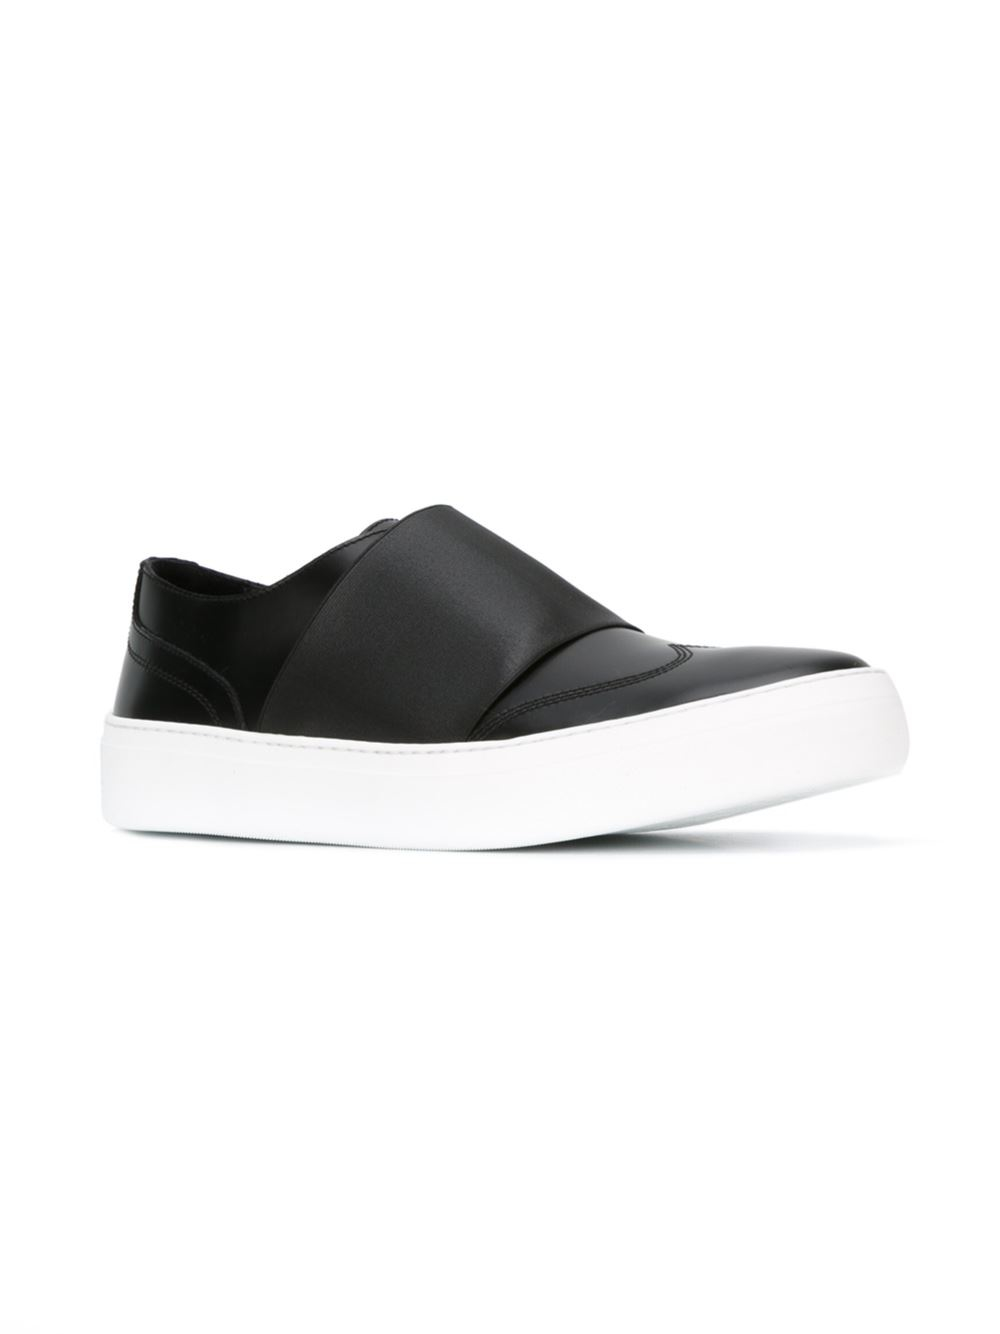 Sneaker Slip On Adam leather stretch stripe black Jimmy Choo London Finishline Online 0YHIH